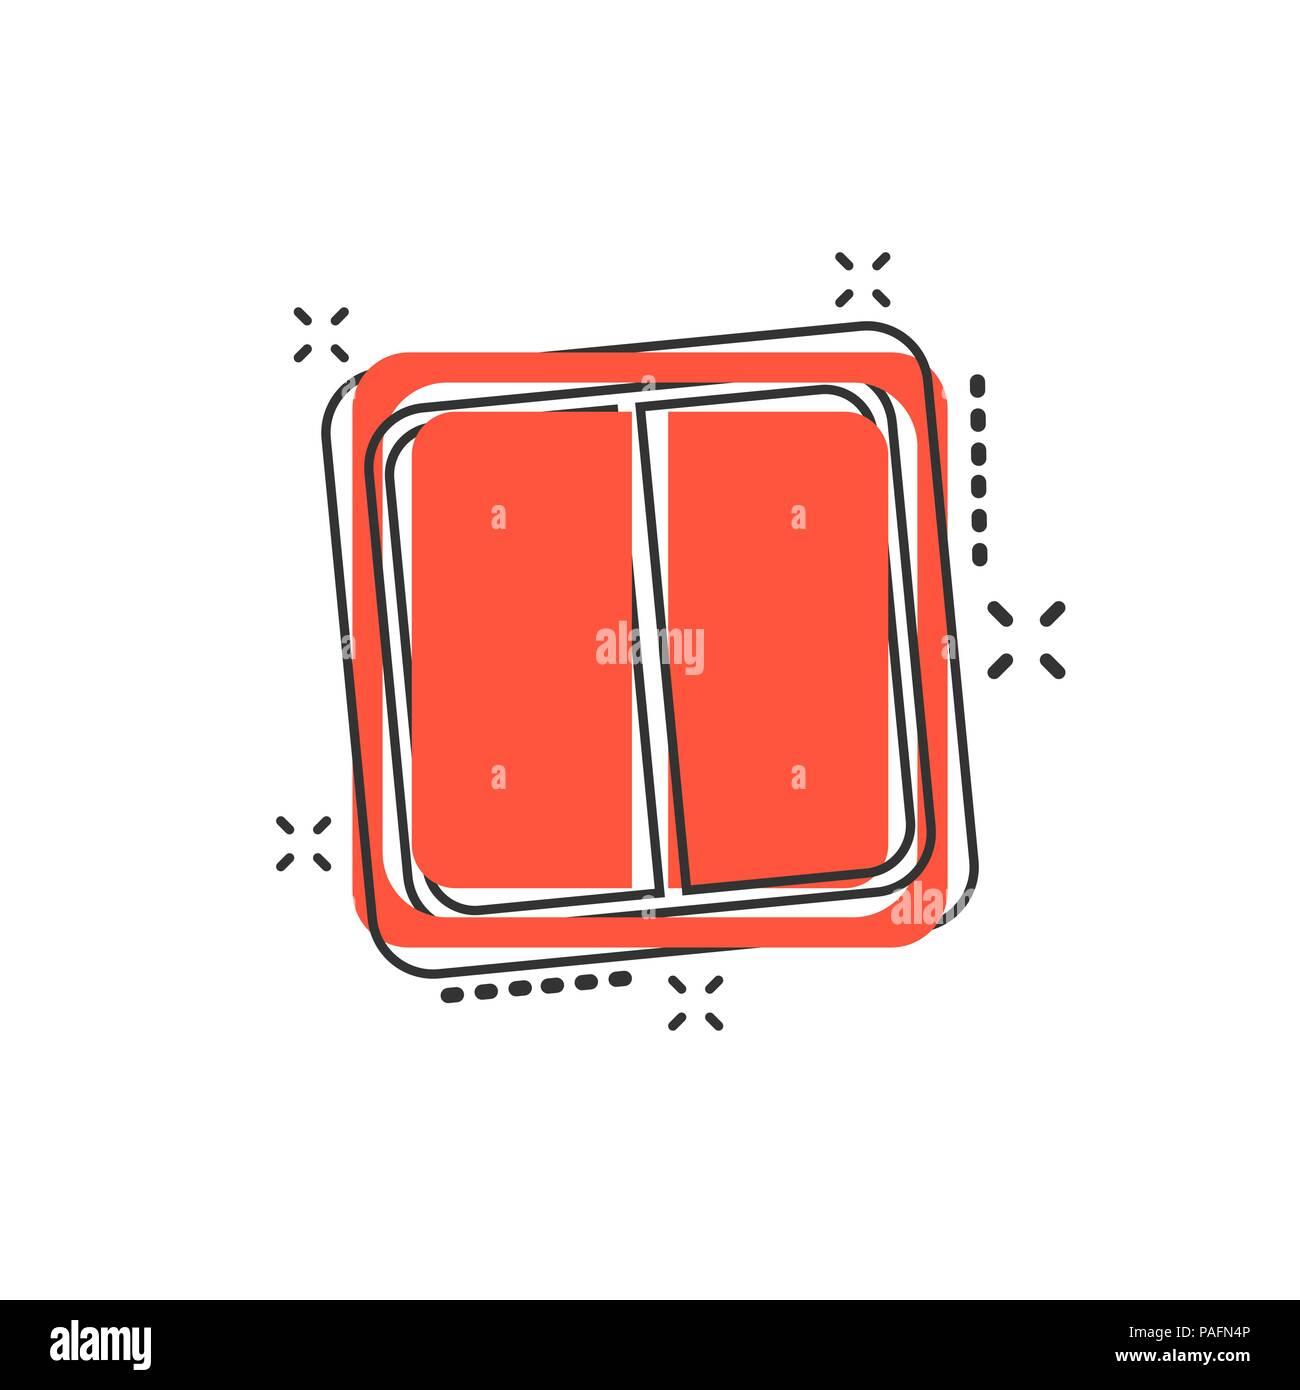 Cartoon Light Switch Stockfotos & Cartoon Light Switch Bilder - Alamy